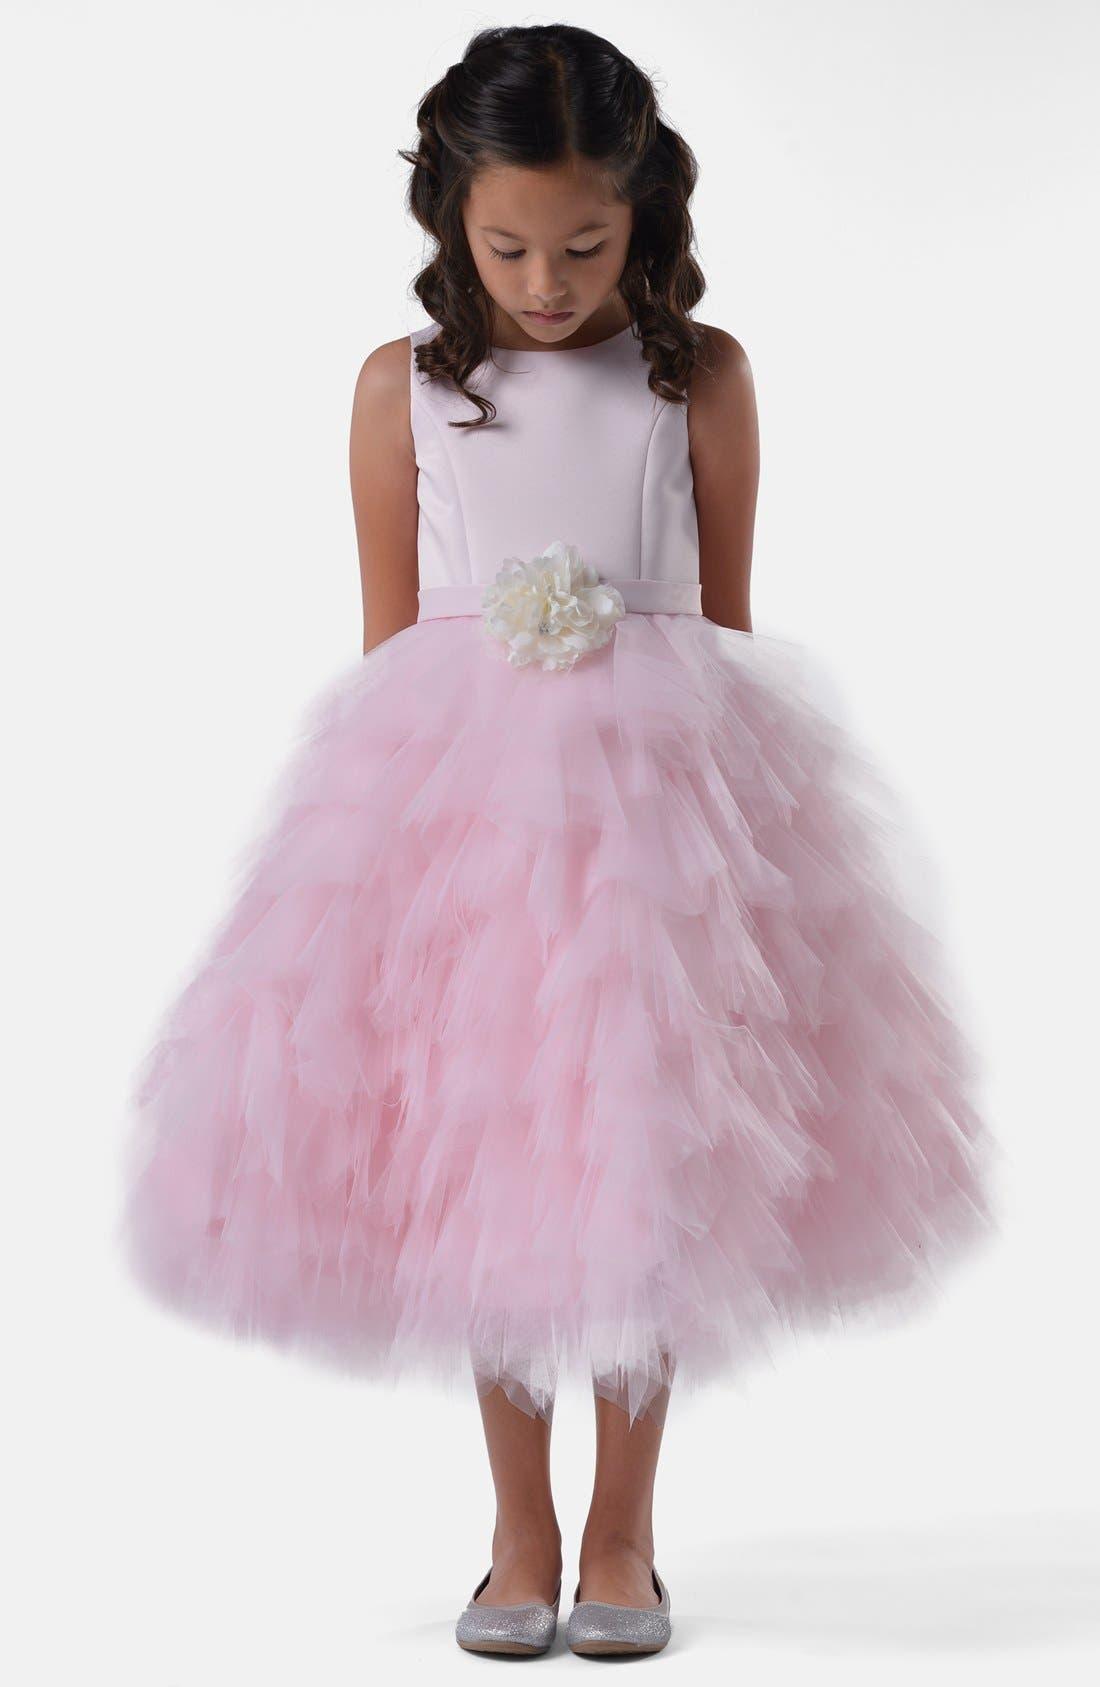 Alternate Image 1 Selected - Us Angels Satin & Tulle Dress (Toddler Girls, Little Girls & Big Girls)